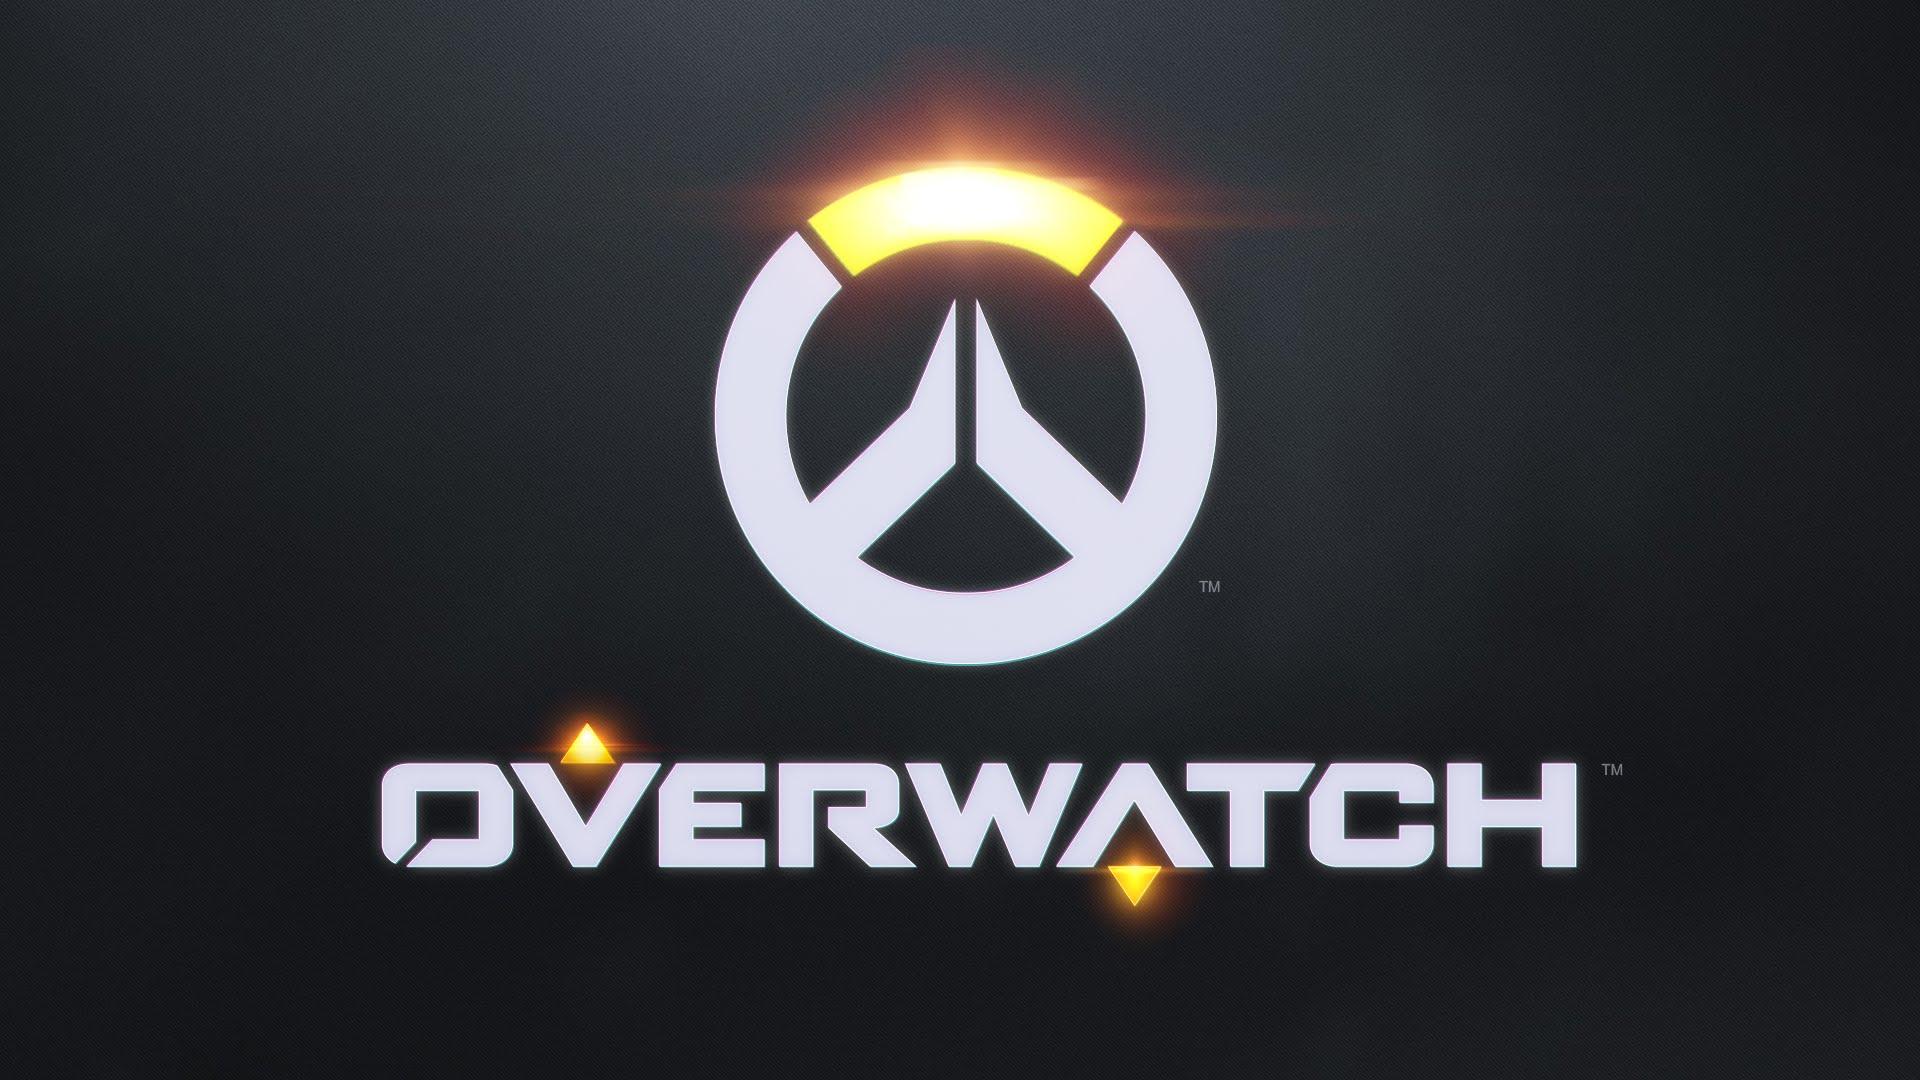 Overwatch07-10-2015